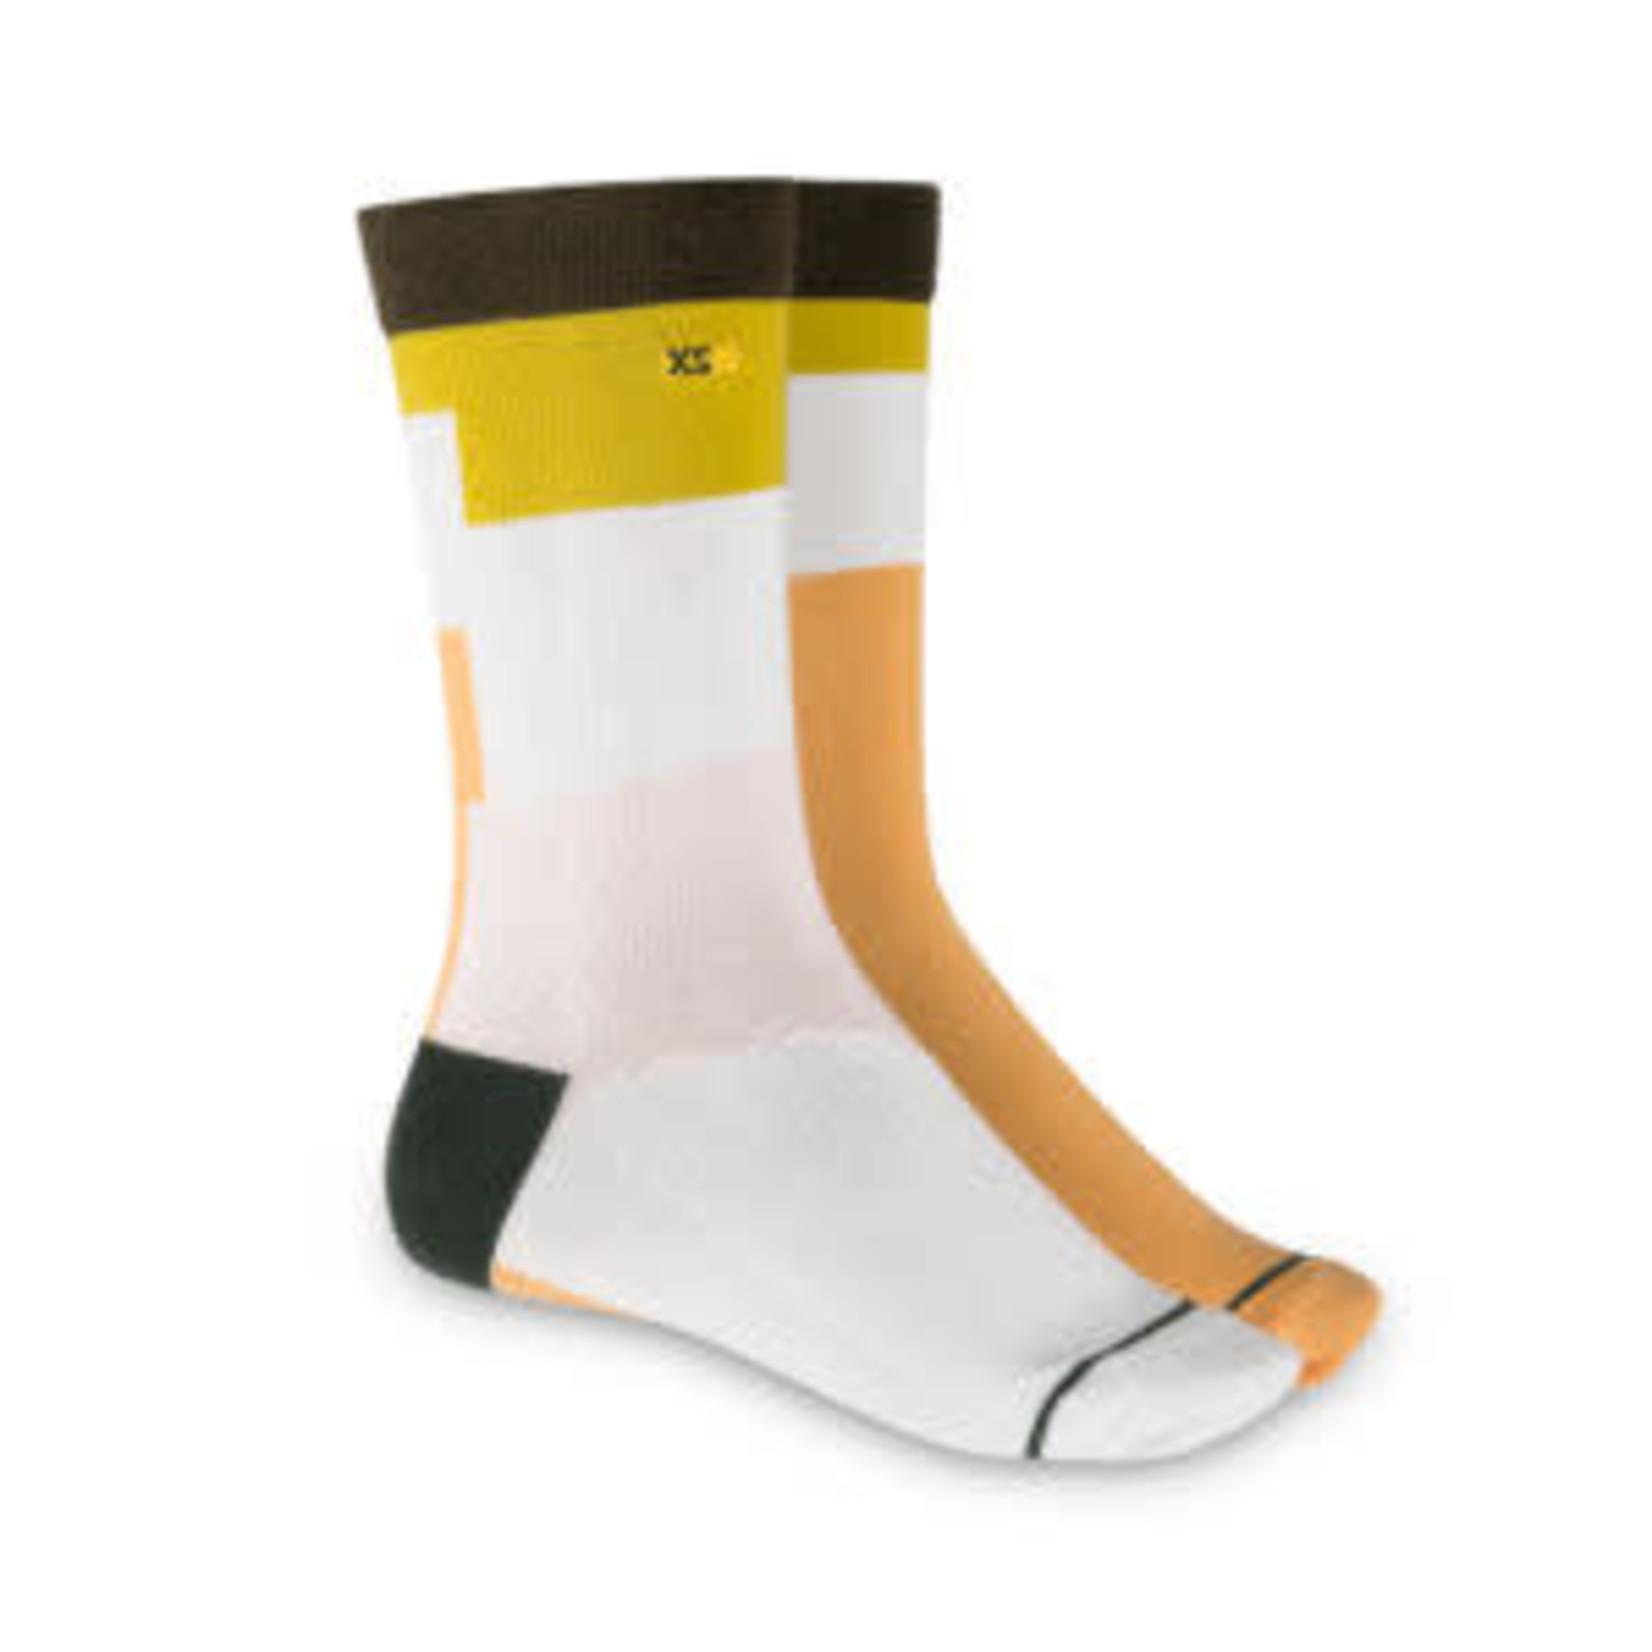 XS Unified XS Unified Artist Series Sock